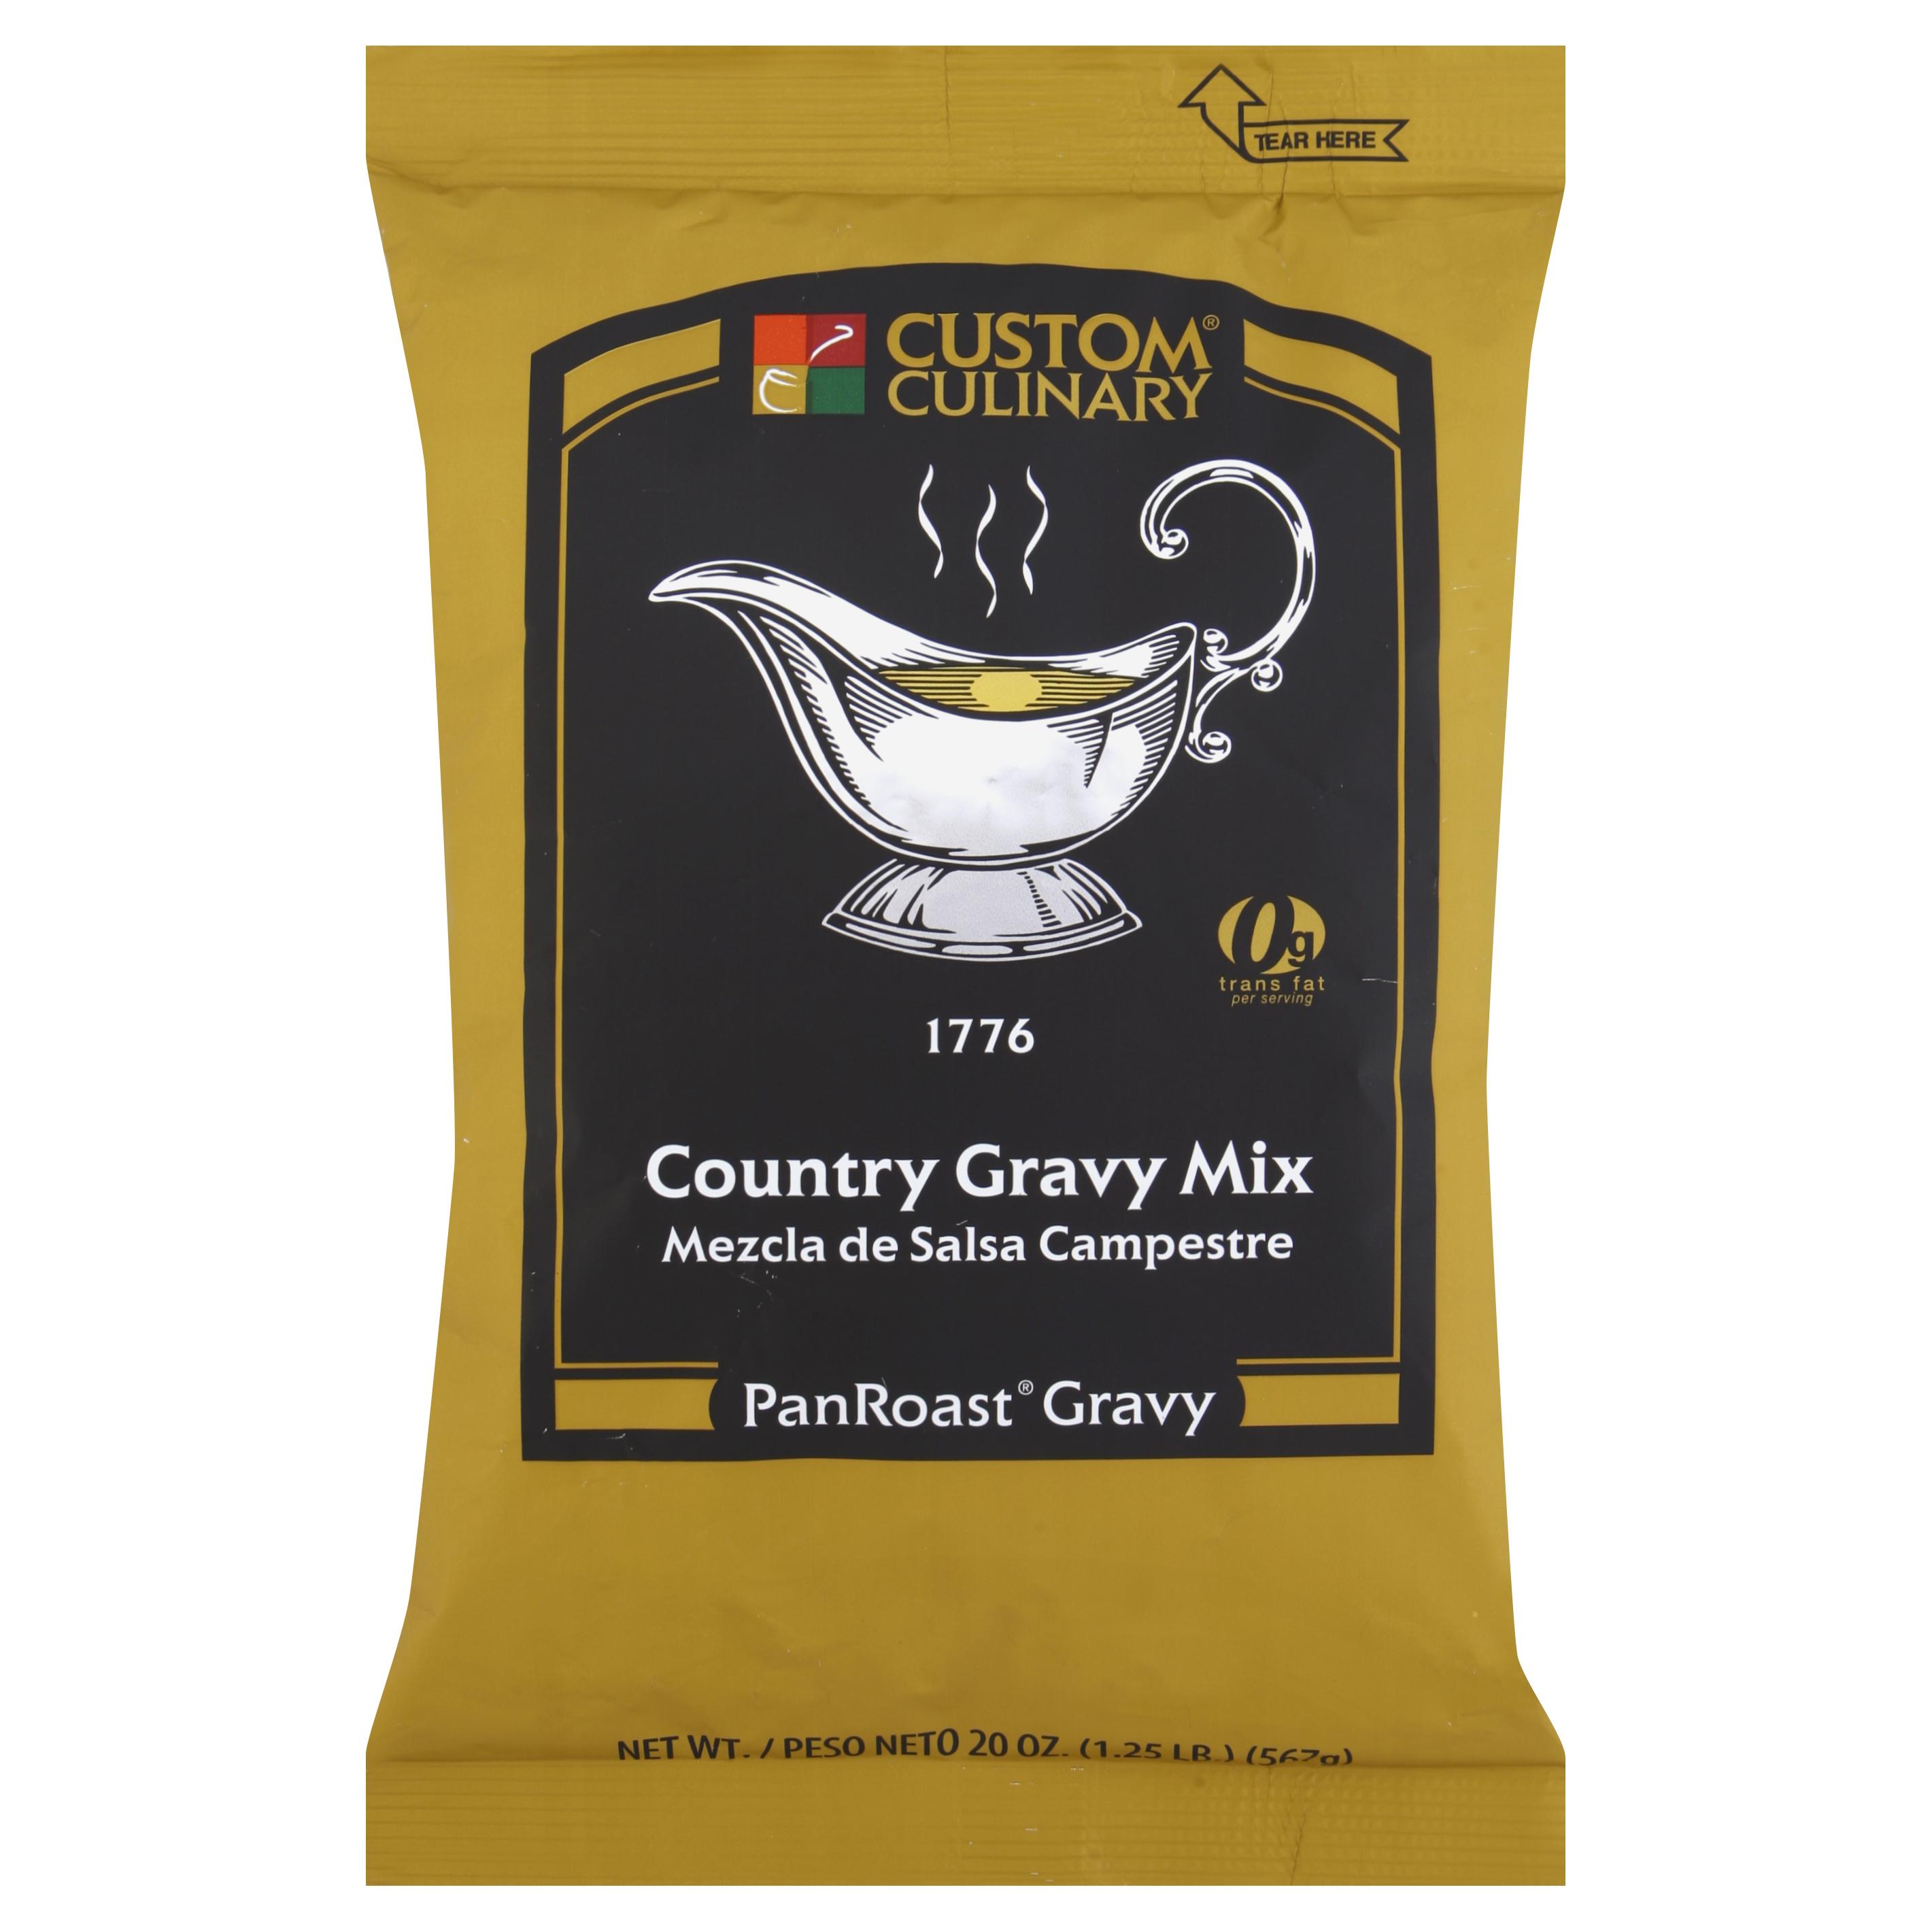 1776 - PanRoast Country Gravy Mix